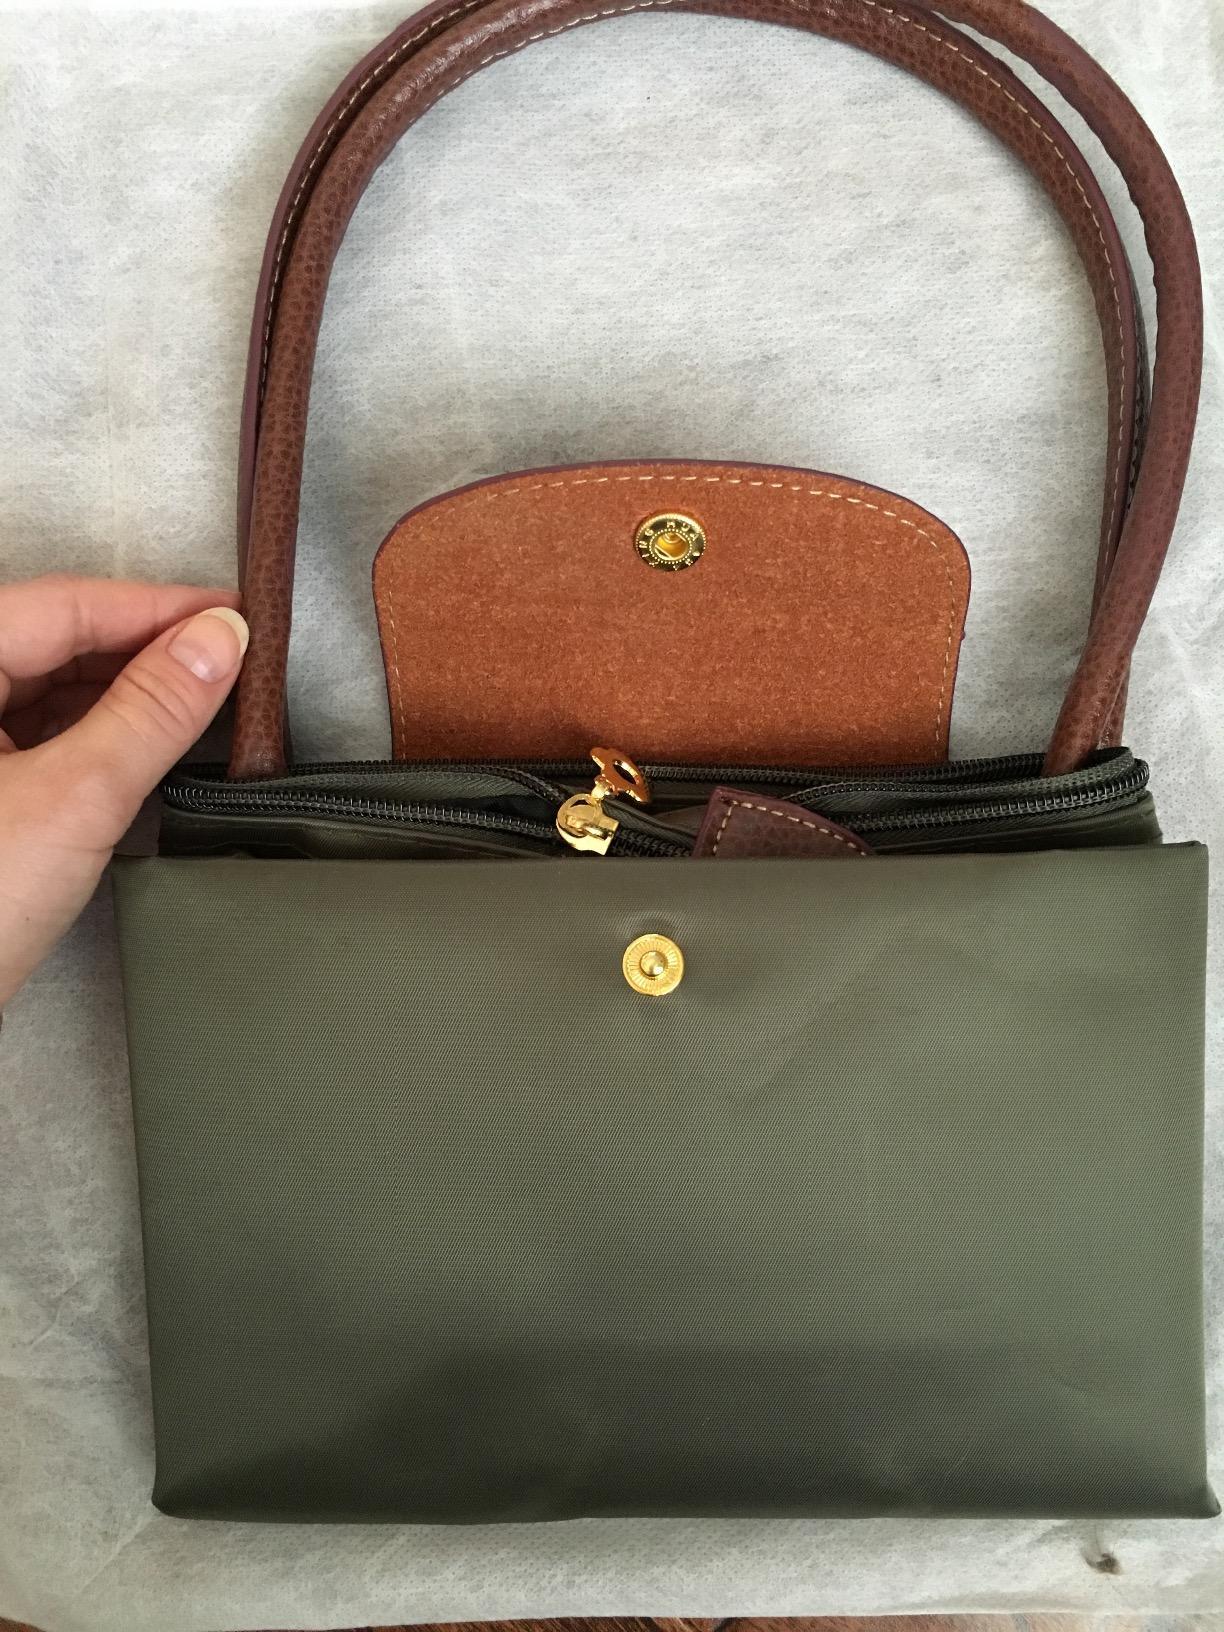 0375ab755ce3 longchamp makeup bag olive green longchamp bag longchamp le pliage ...